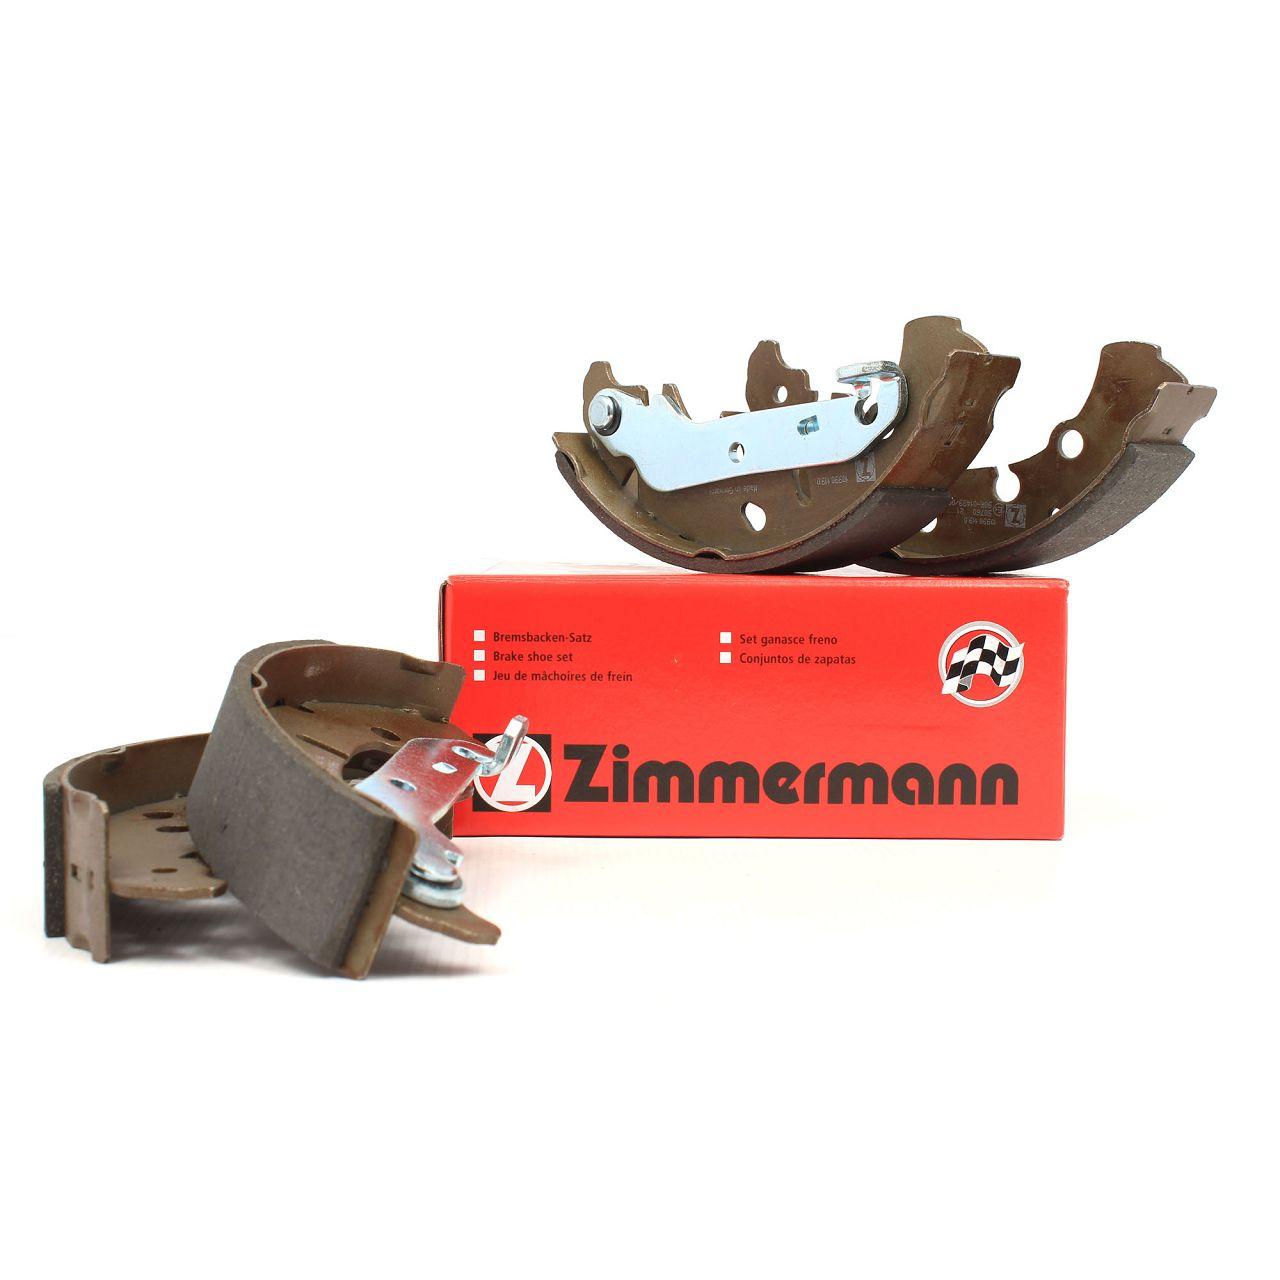 ZIMMERMANN Bremsbacken Satz FORD Fiesta 4 5 Fusion KA Puma MAZDA 121 III 2 (DY)